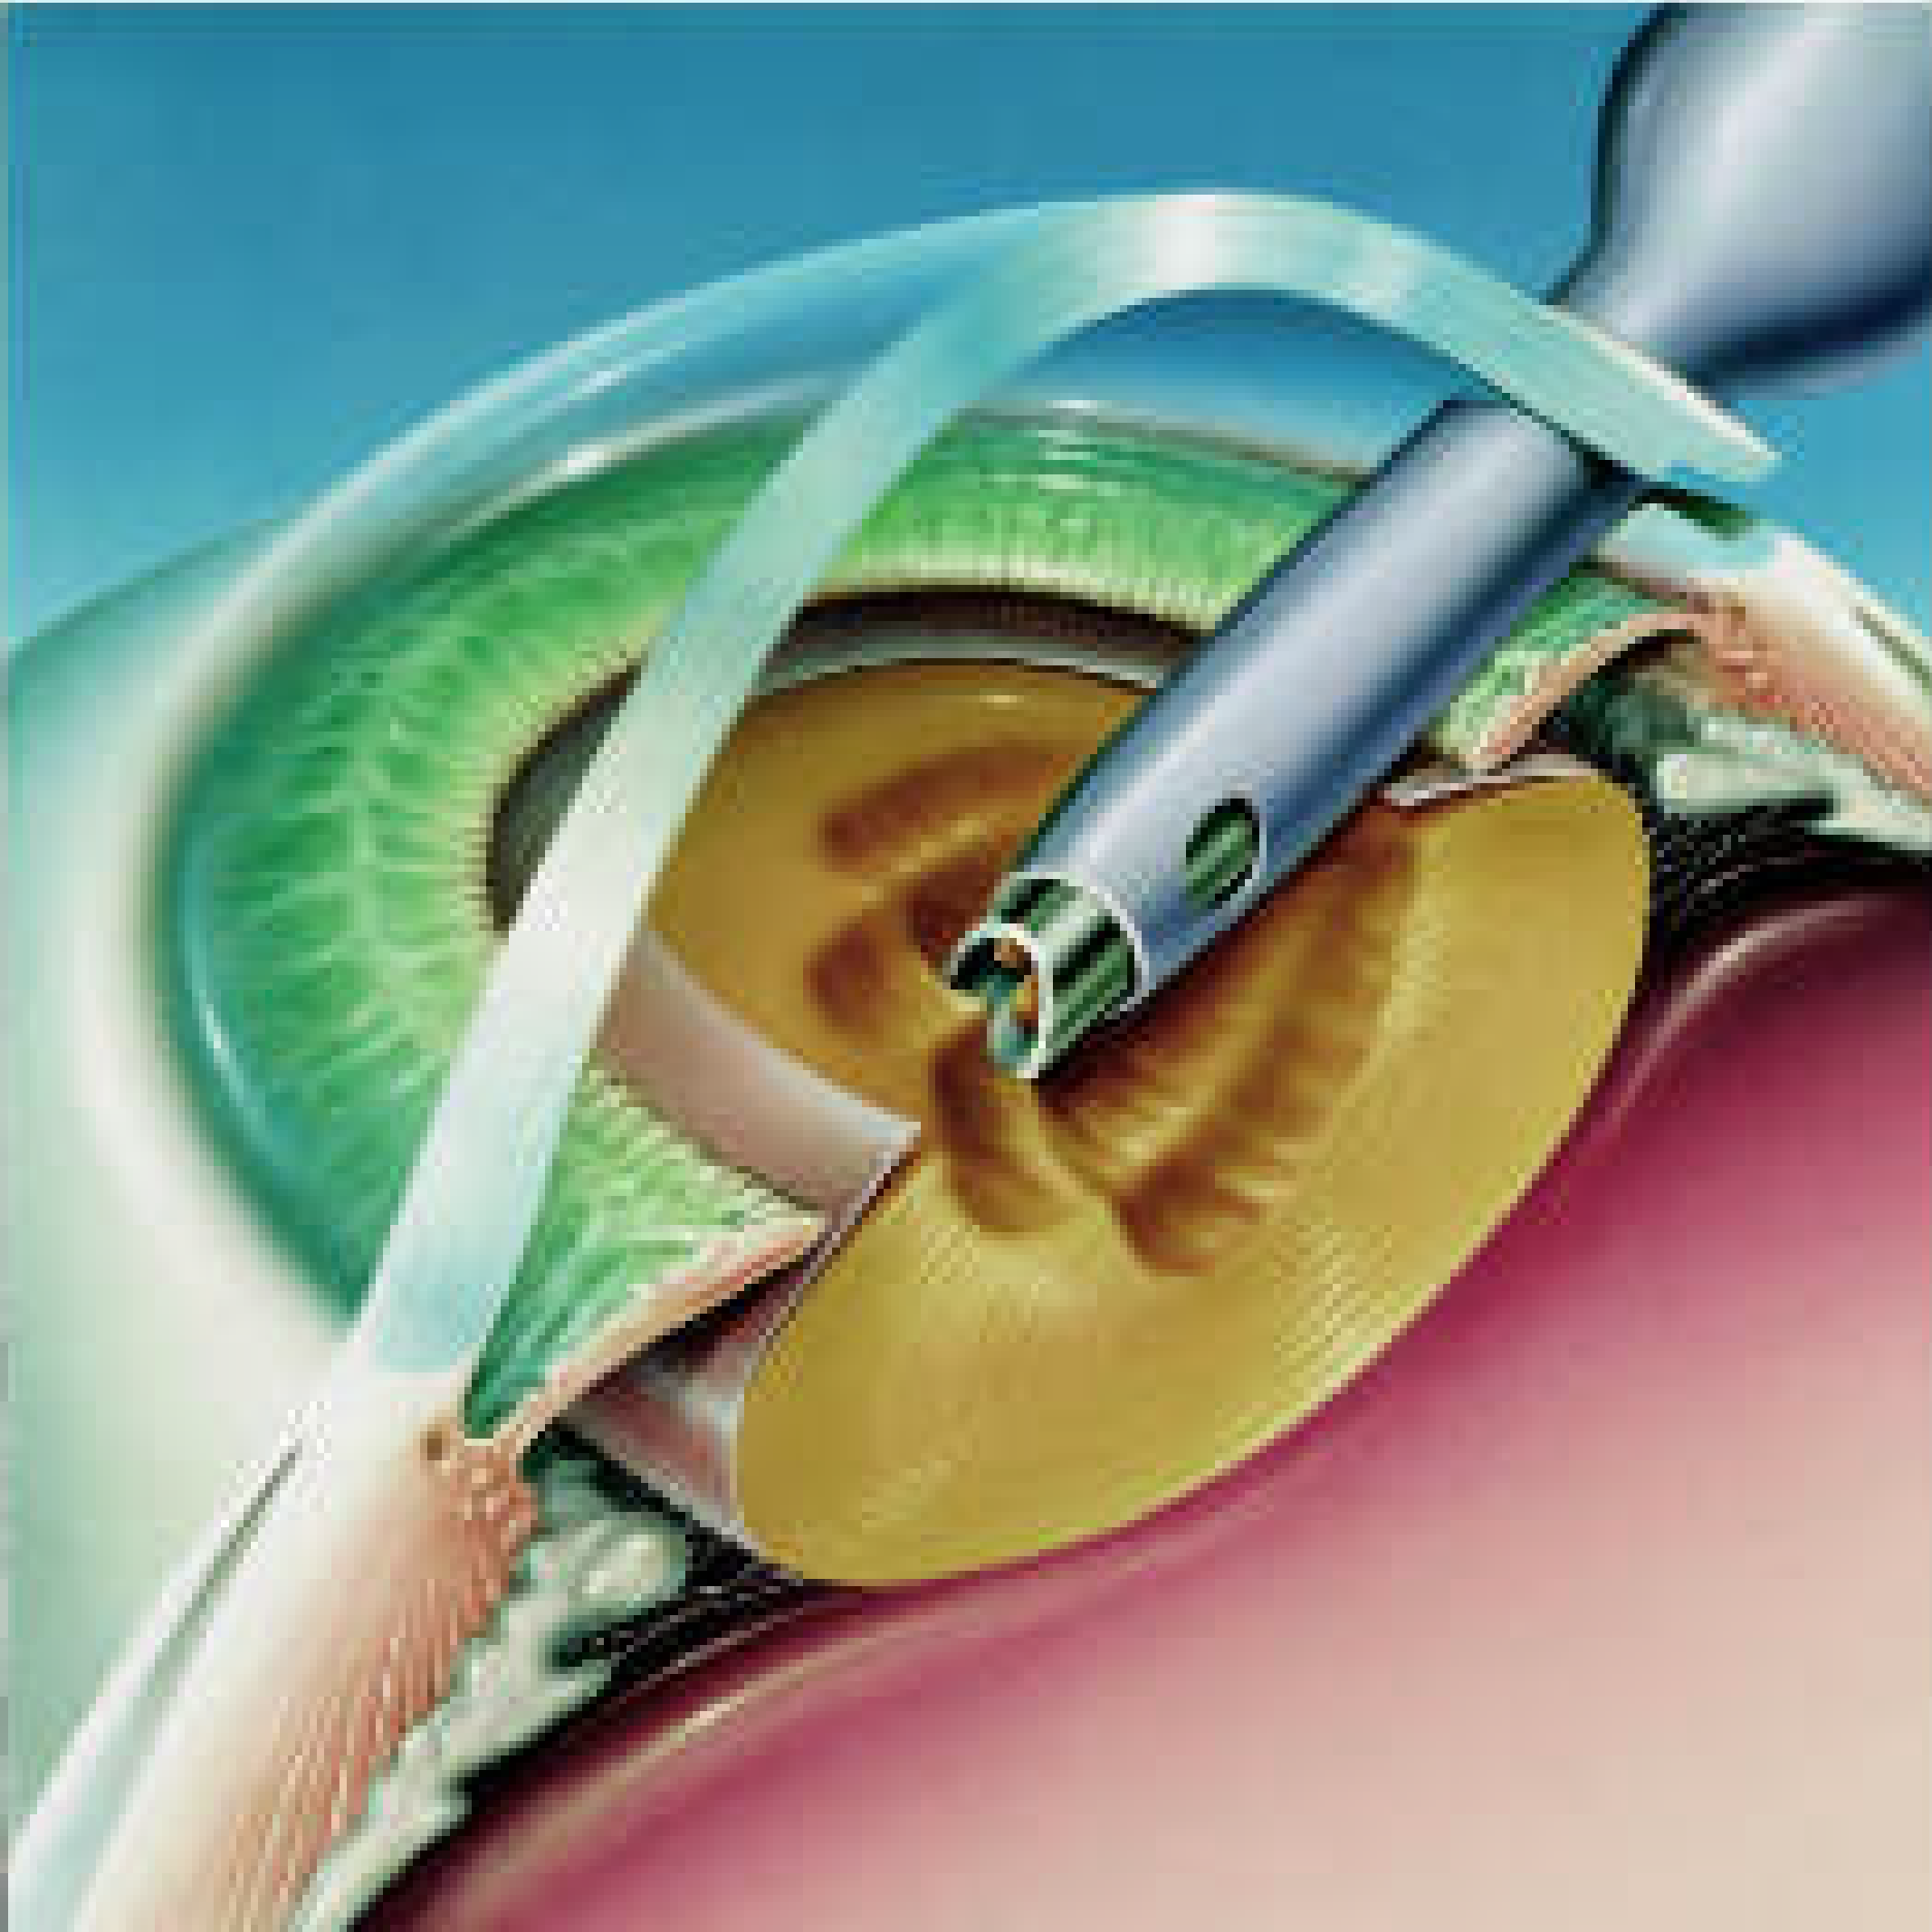 09-Steps-of-surgery1-sm-01